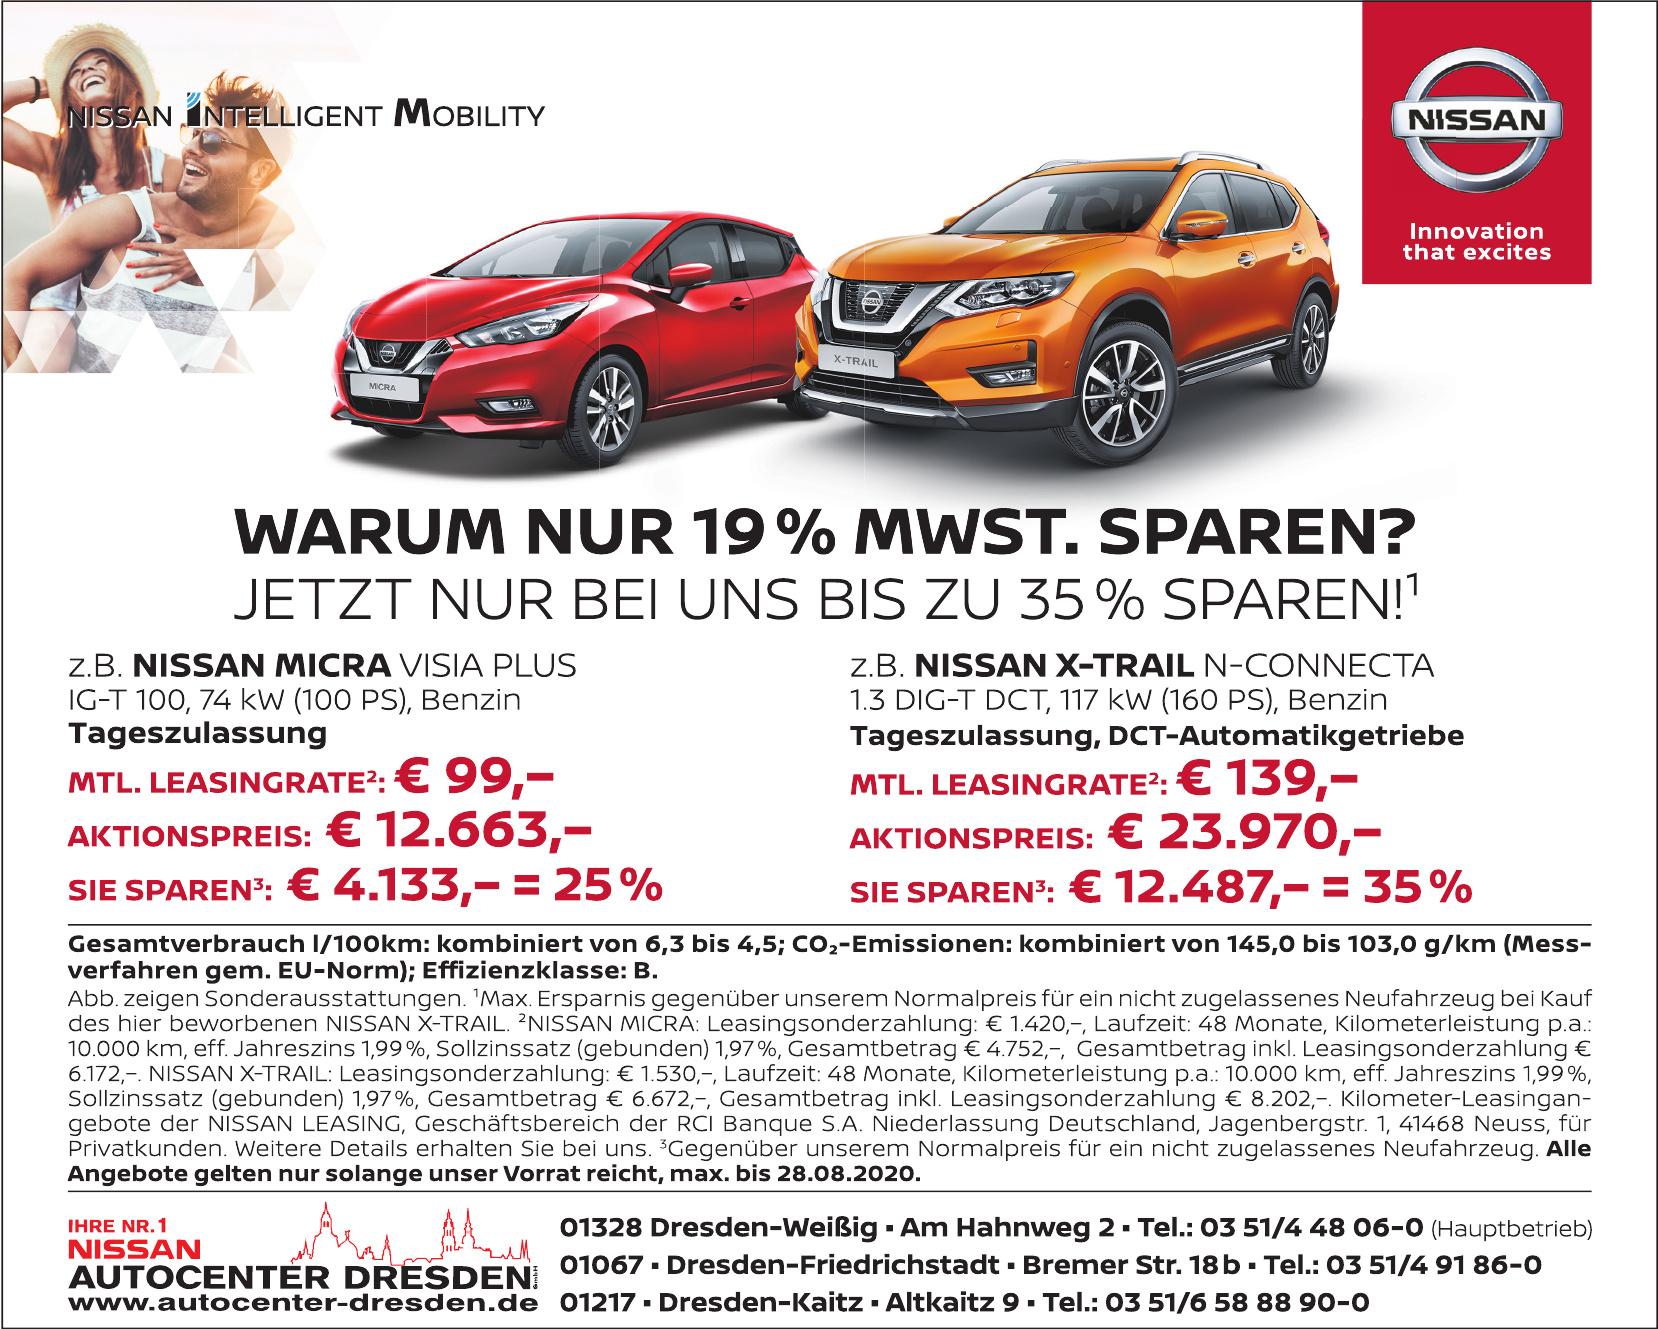 Nissan Autocenter Dresden GmbH